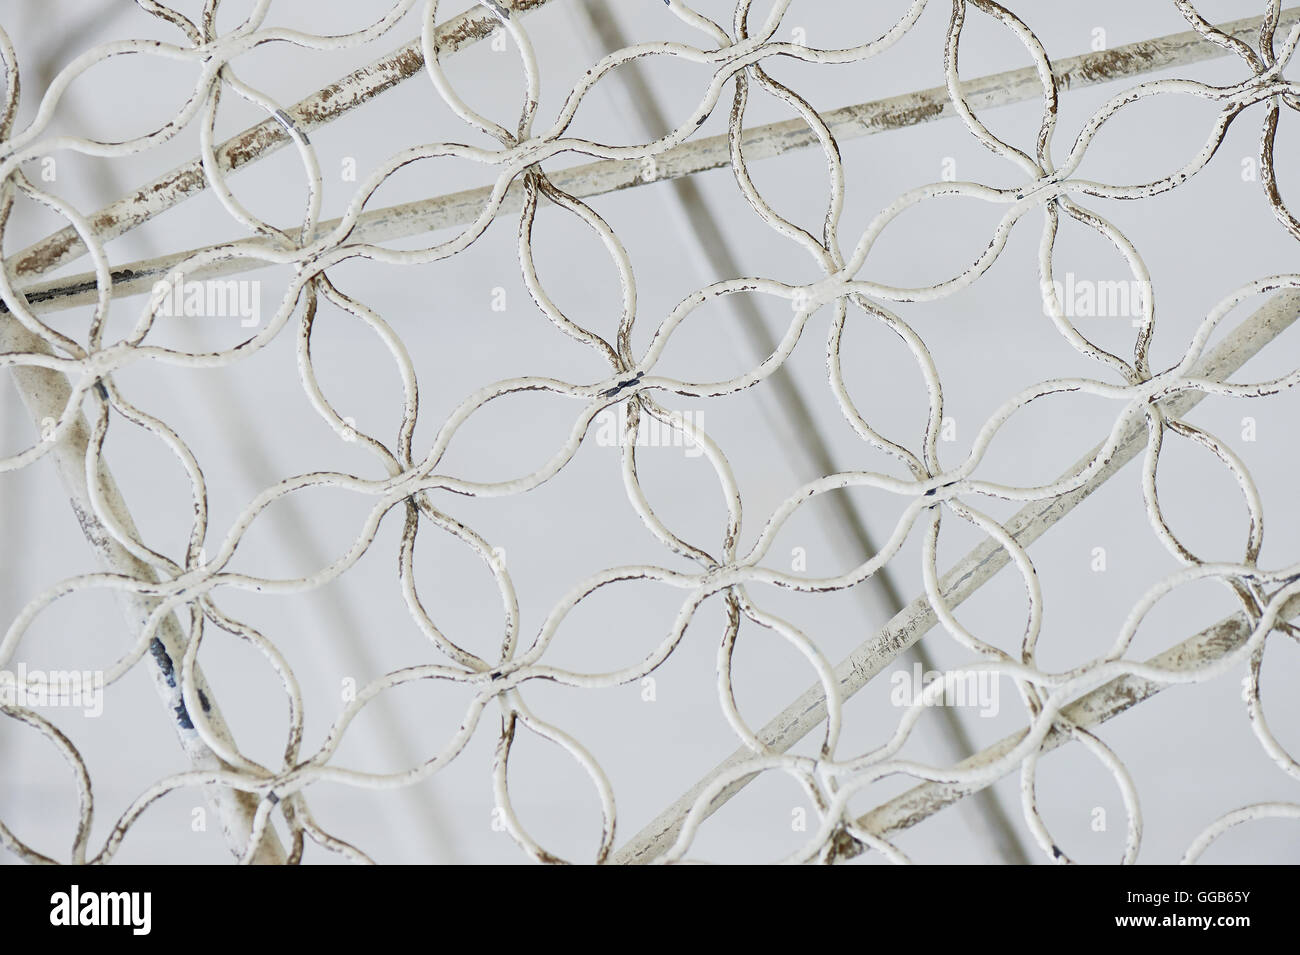 Metallic light white fishnet mesh wire. - Stock Image